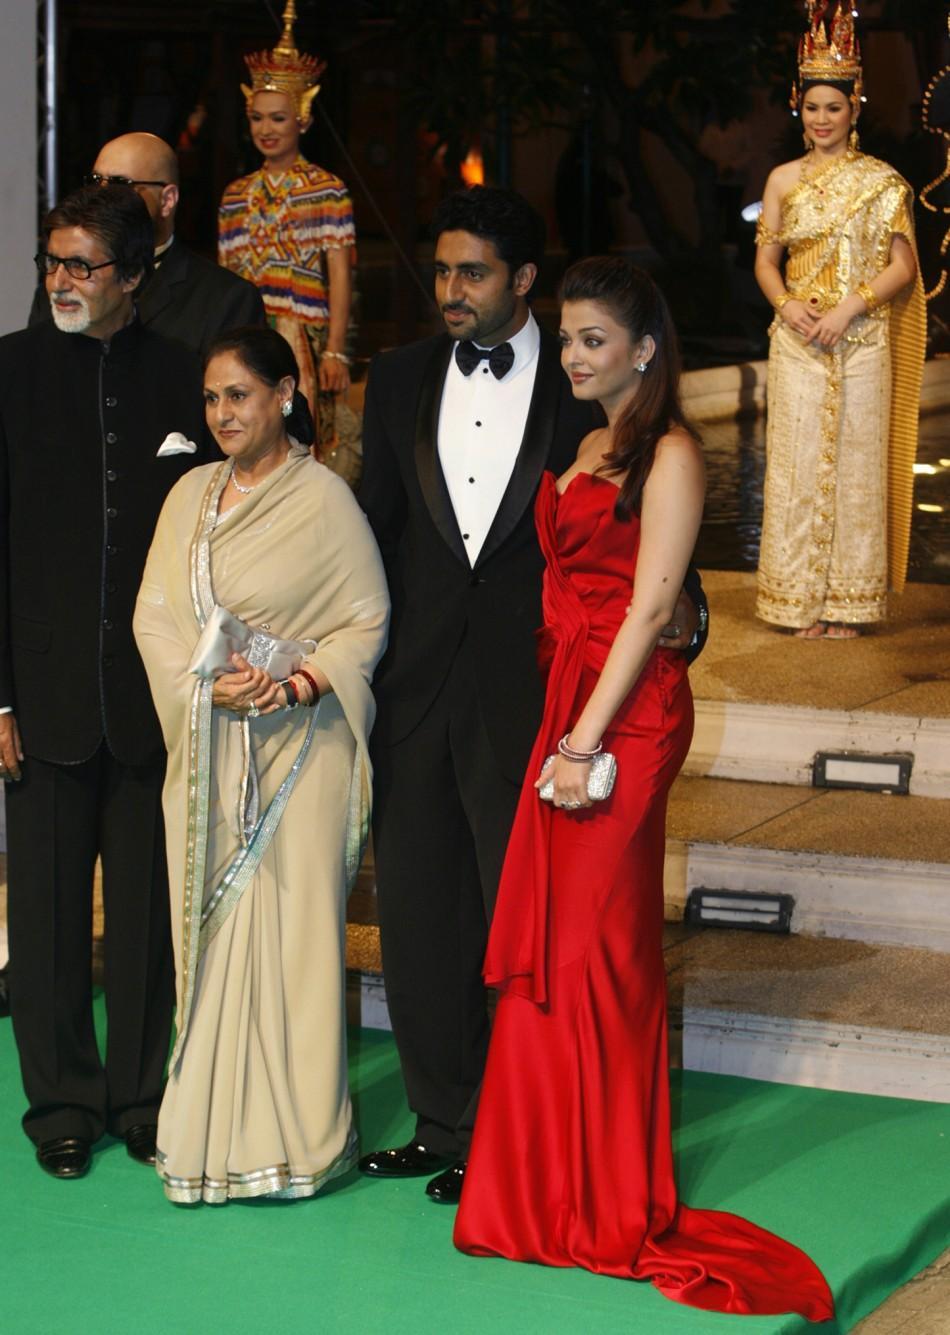 Aishwarya rai india superstar hot sex india - 1 part 7